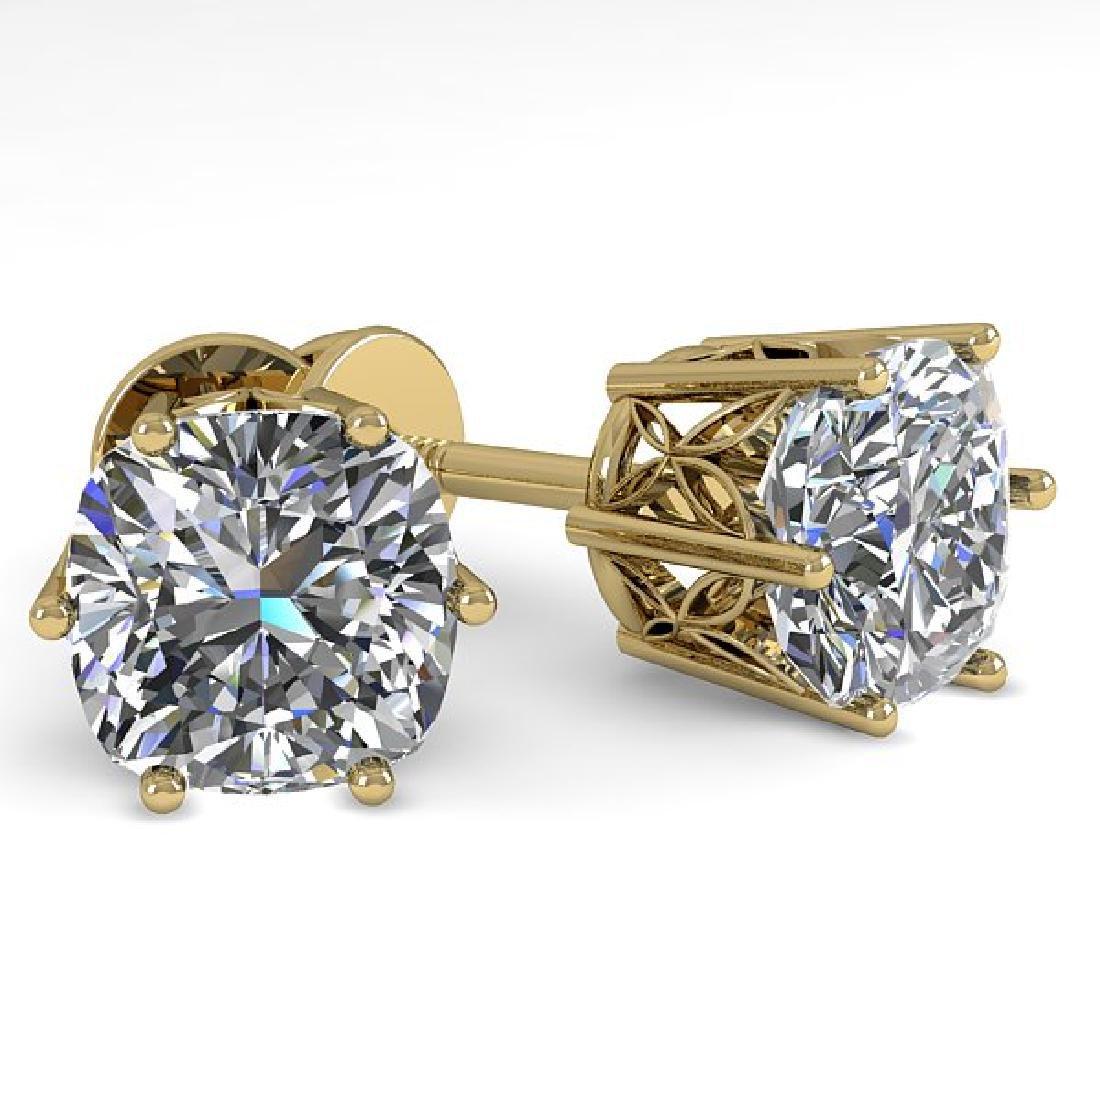 1.0 CTW VS/SI Cushion Cut Diamond Stud Art Deco